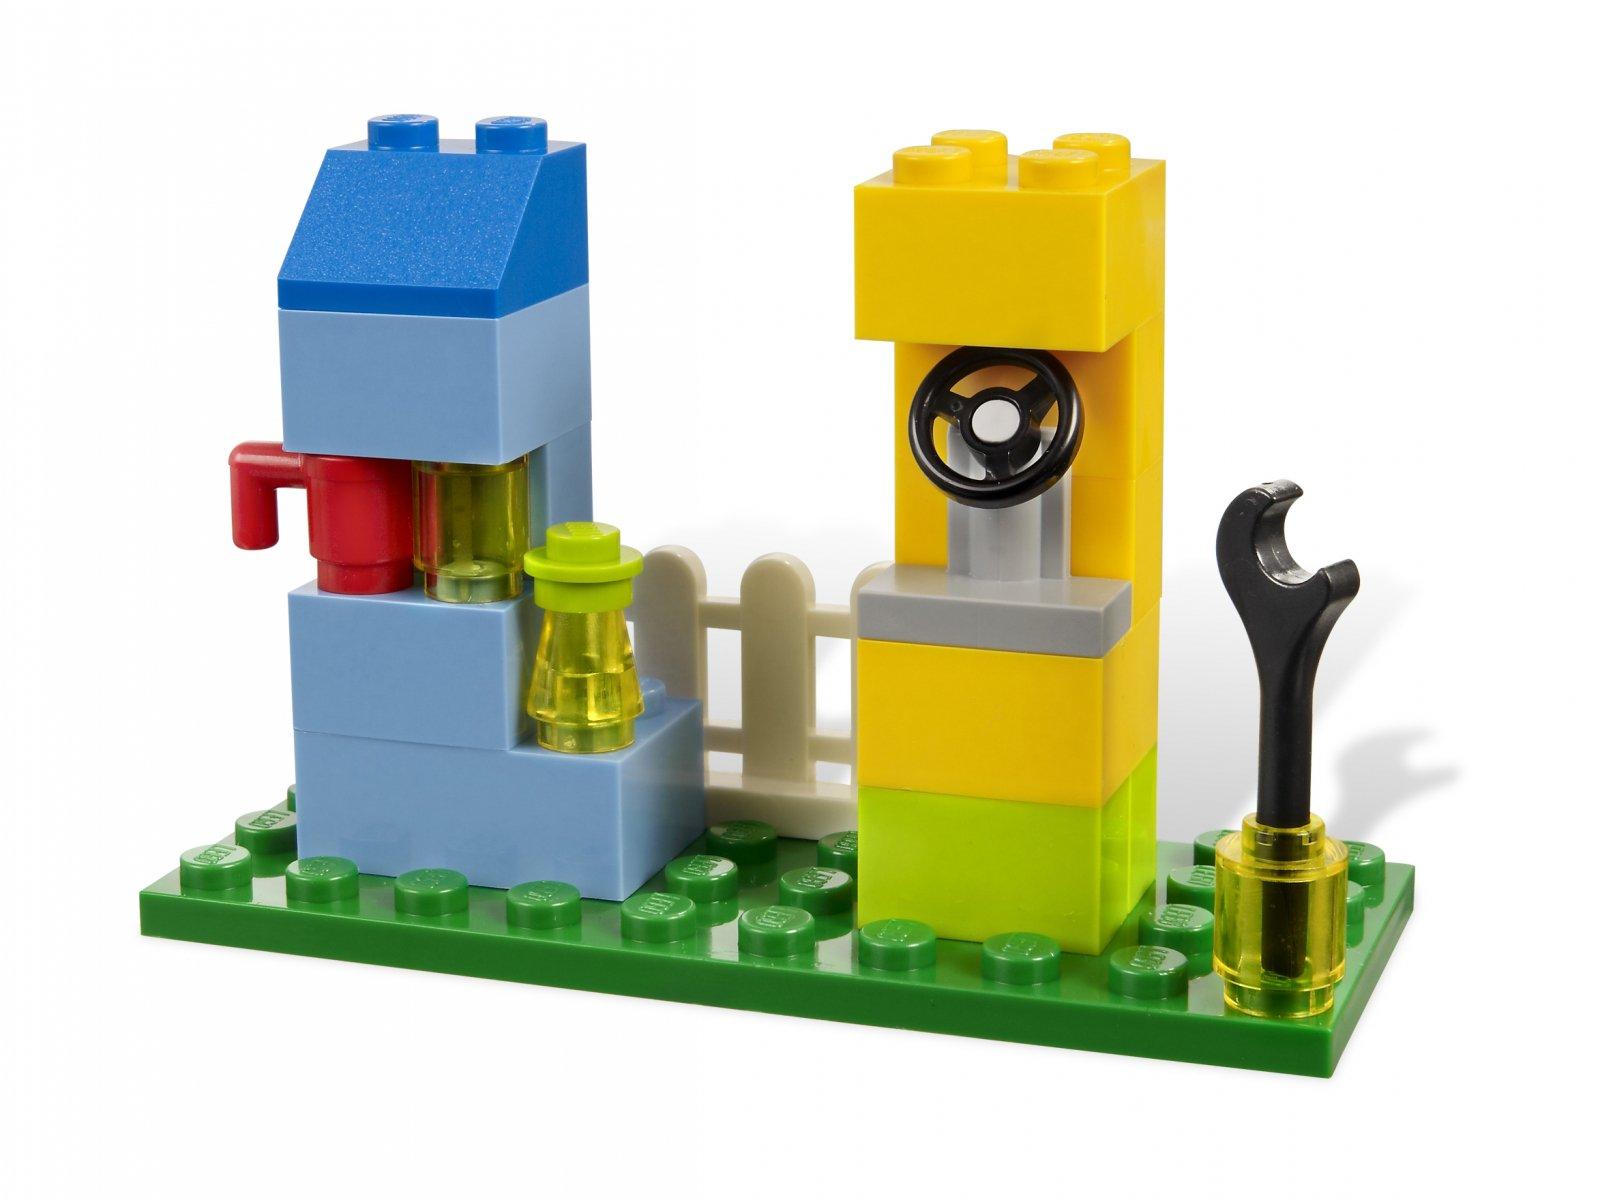 LEGO Bricks & More 5899 Zestaw do budowy domu